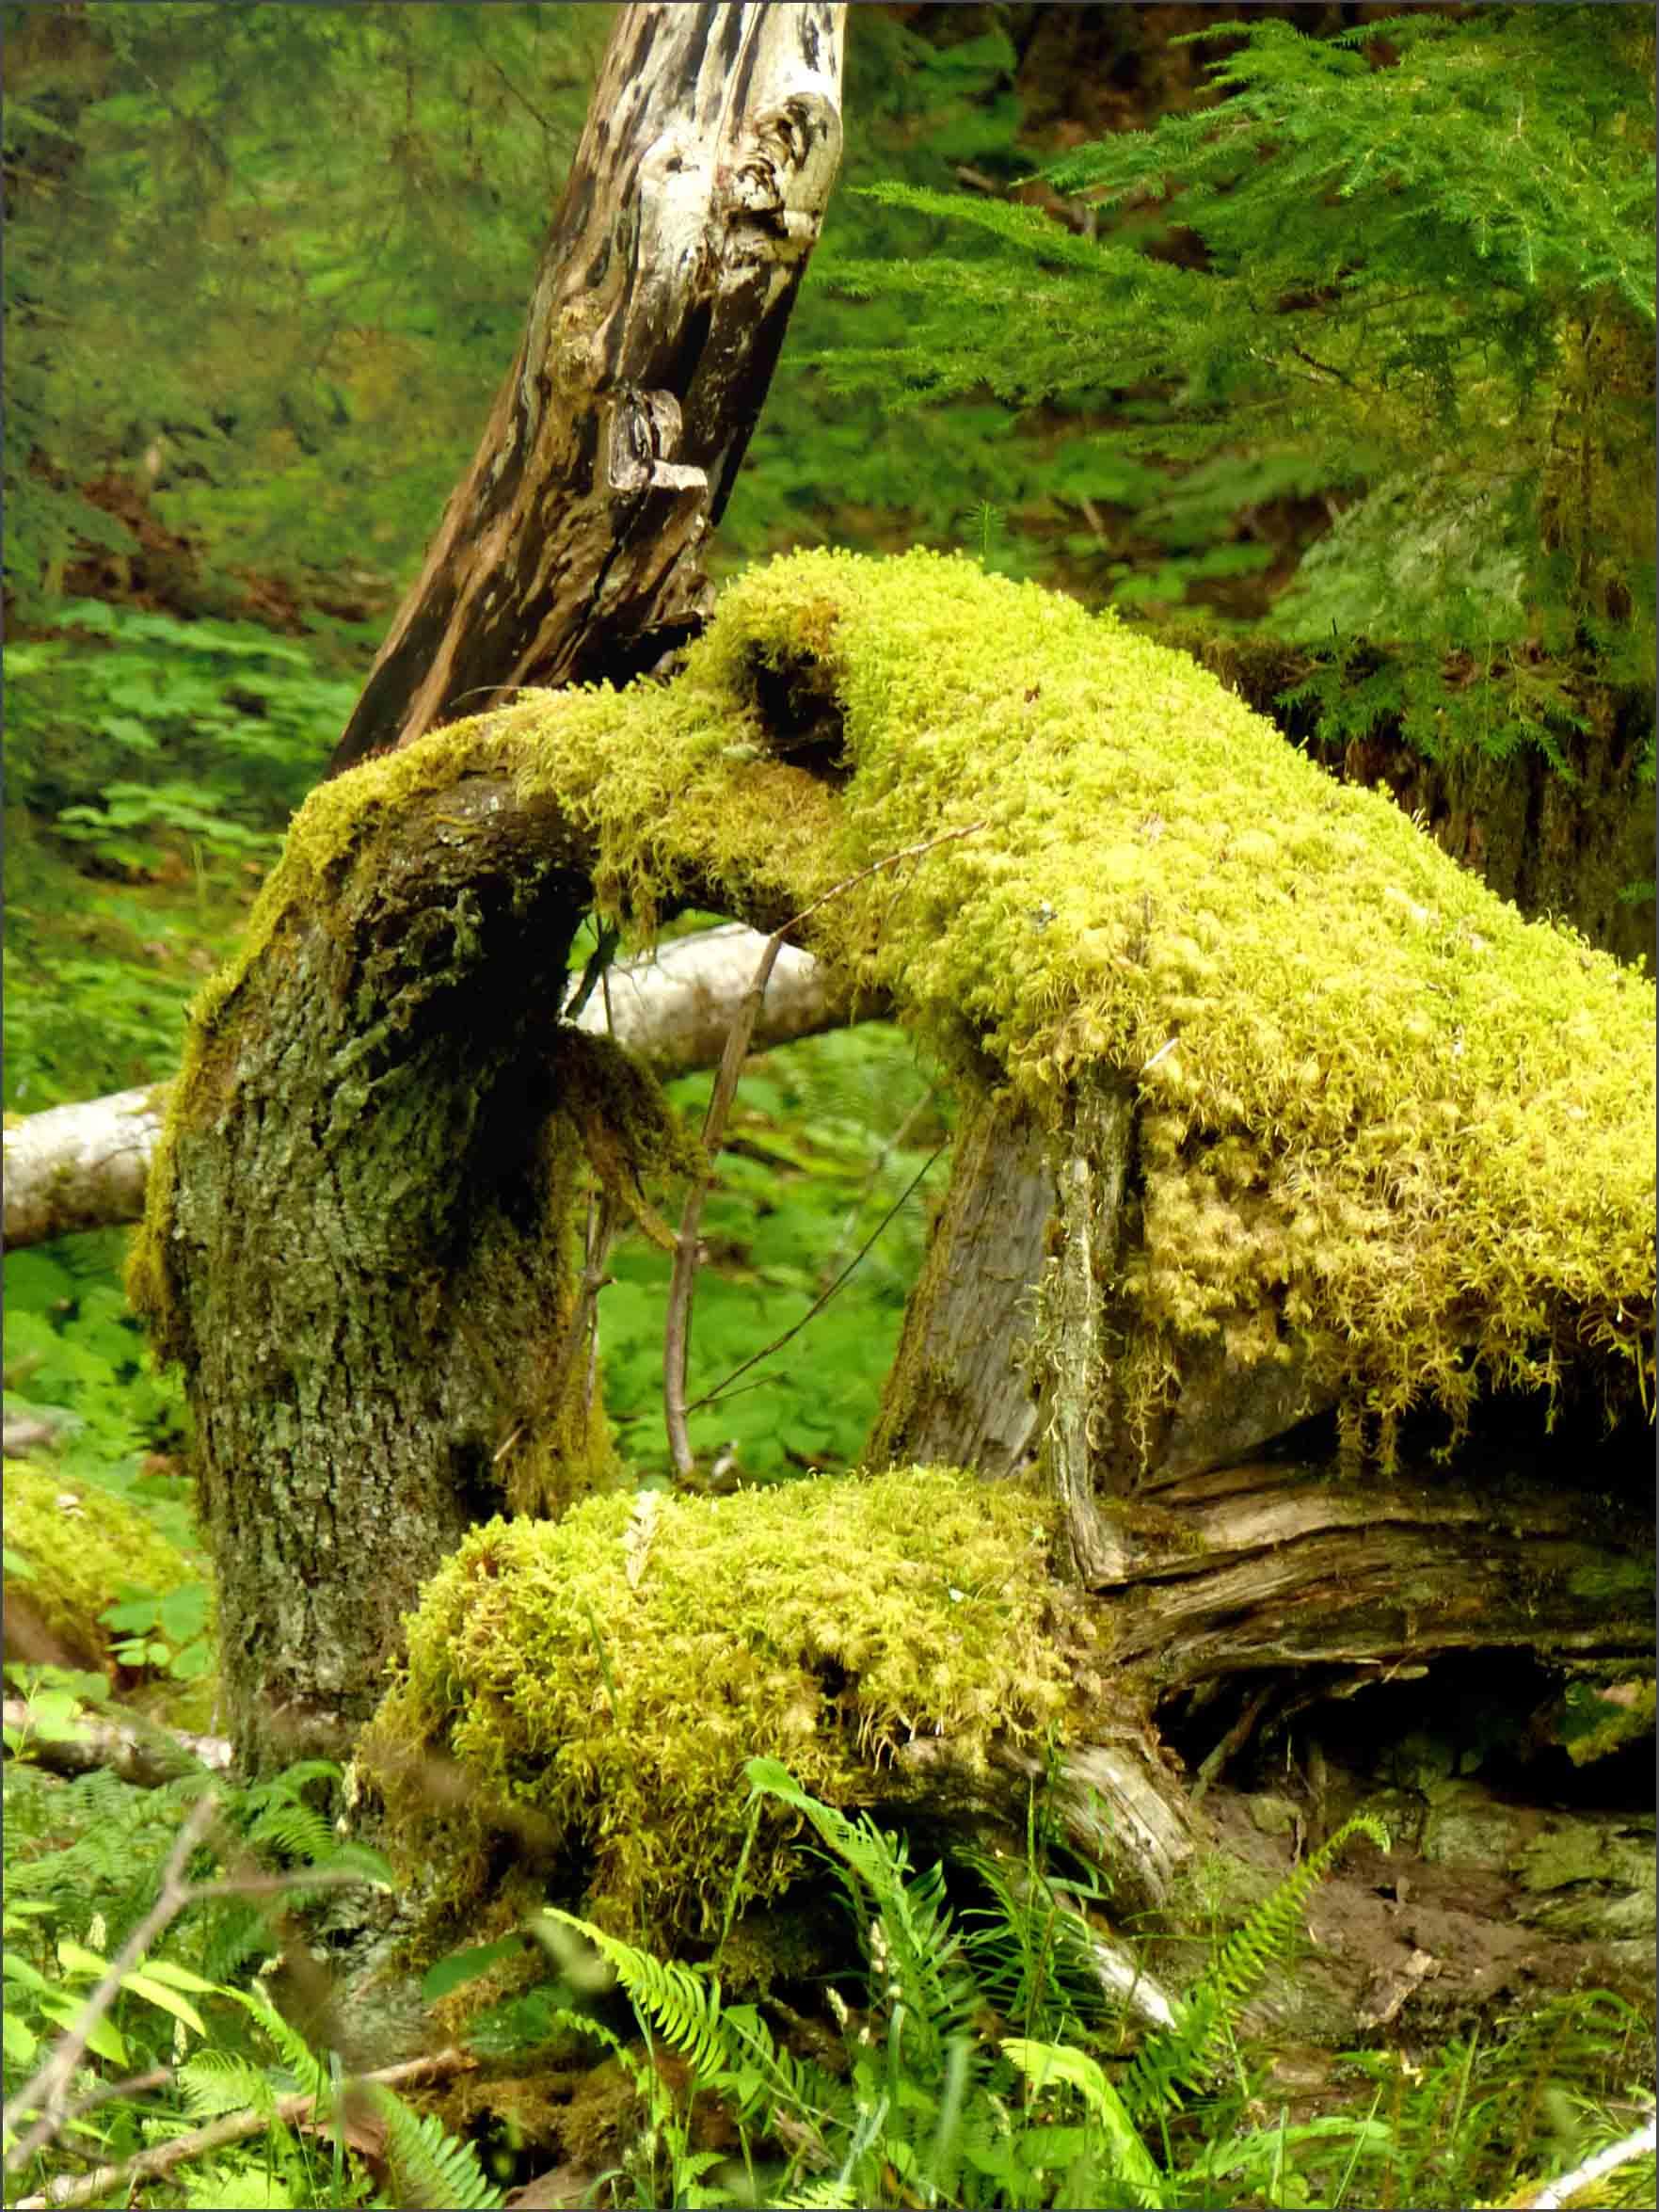 Tree draped with lichen